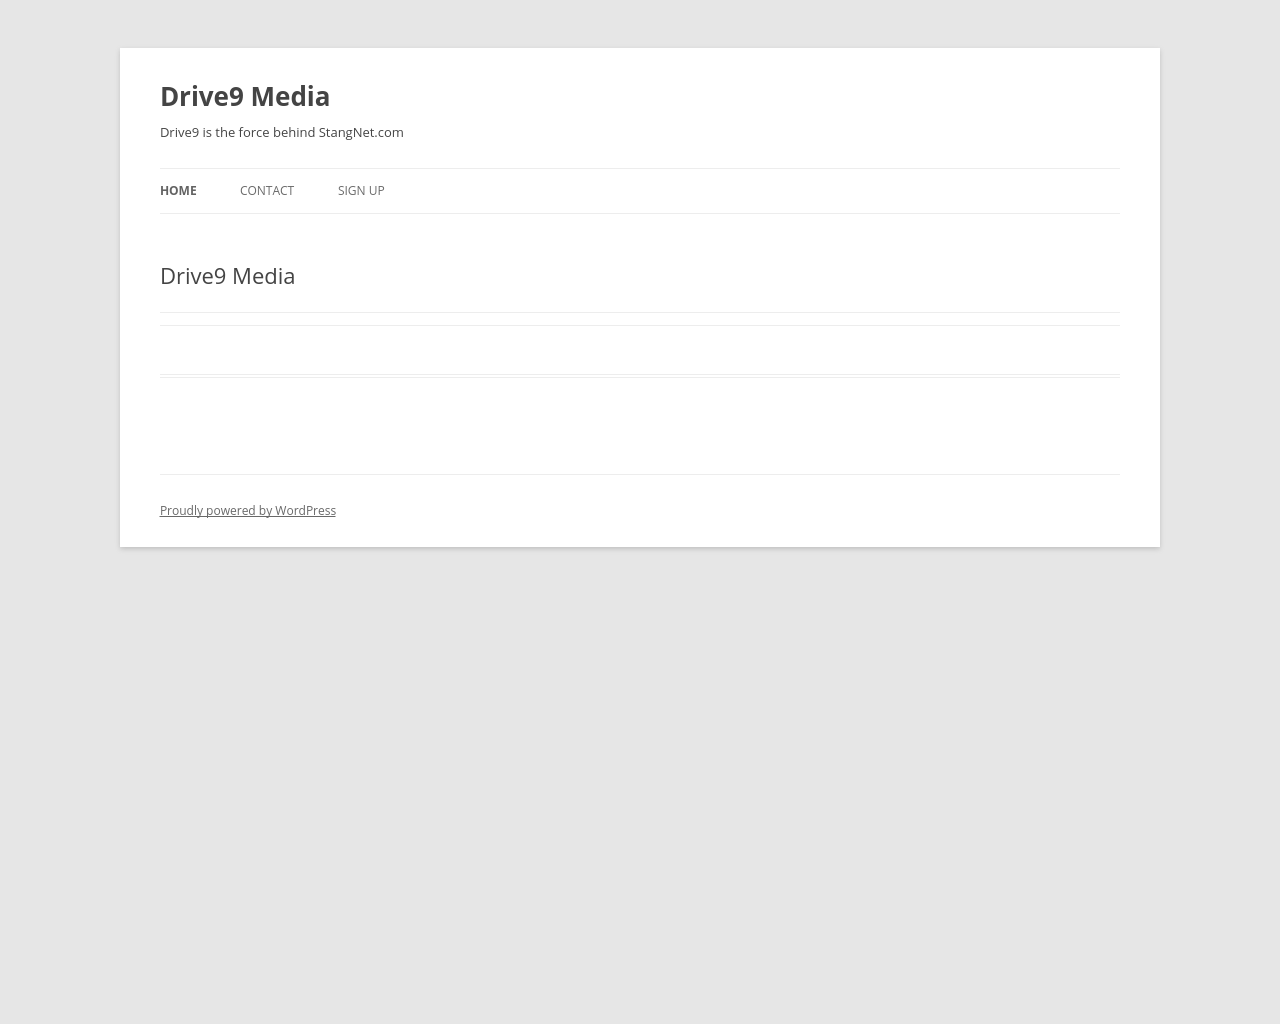 Drive9-Media-Advertising-Reviews-Pricing